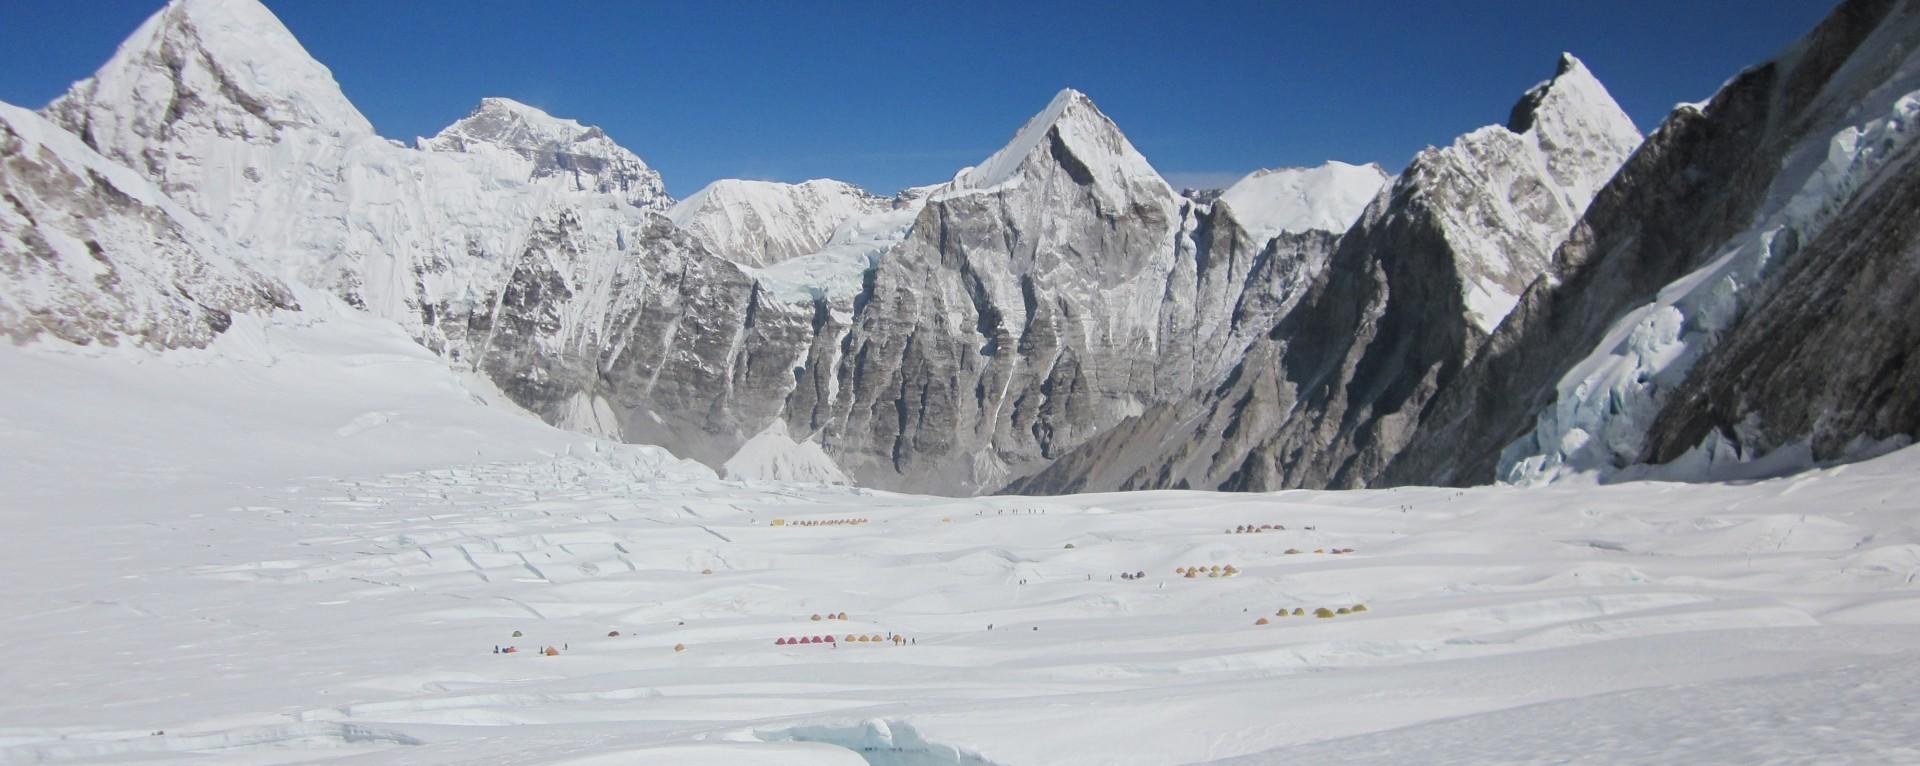 Camp II of Mt. Everest climbing trip